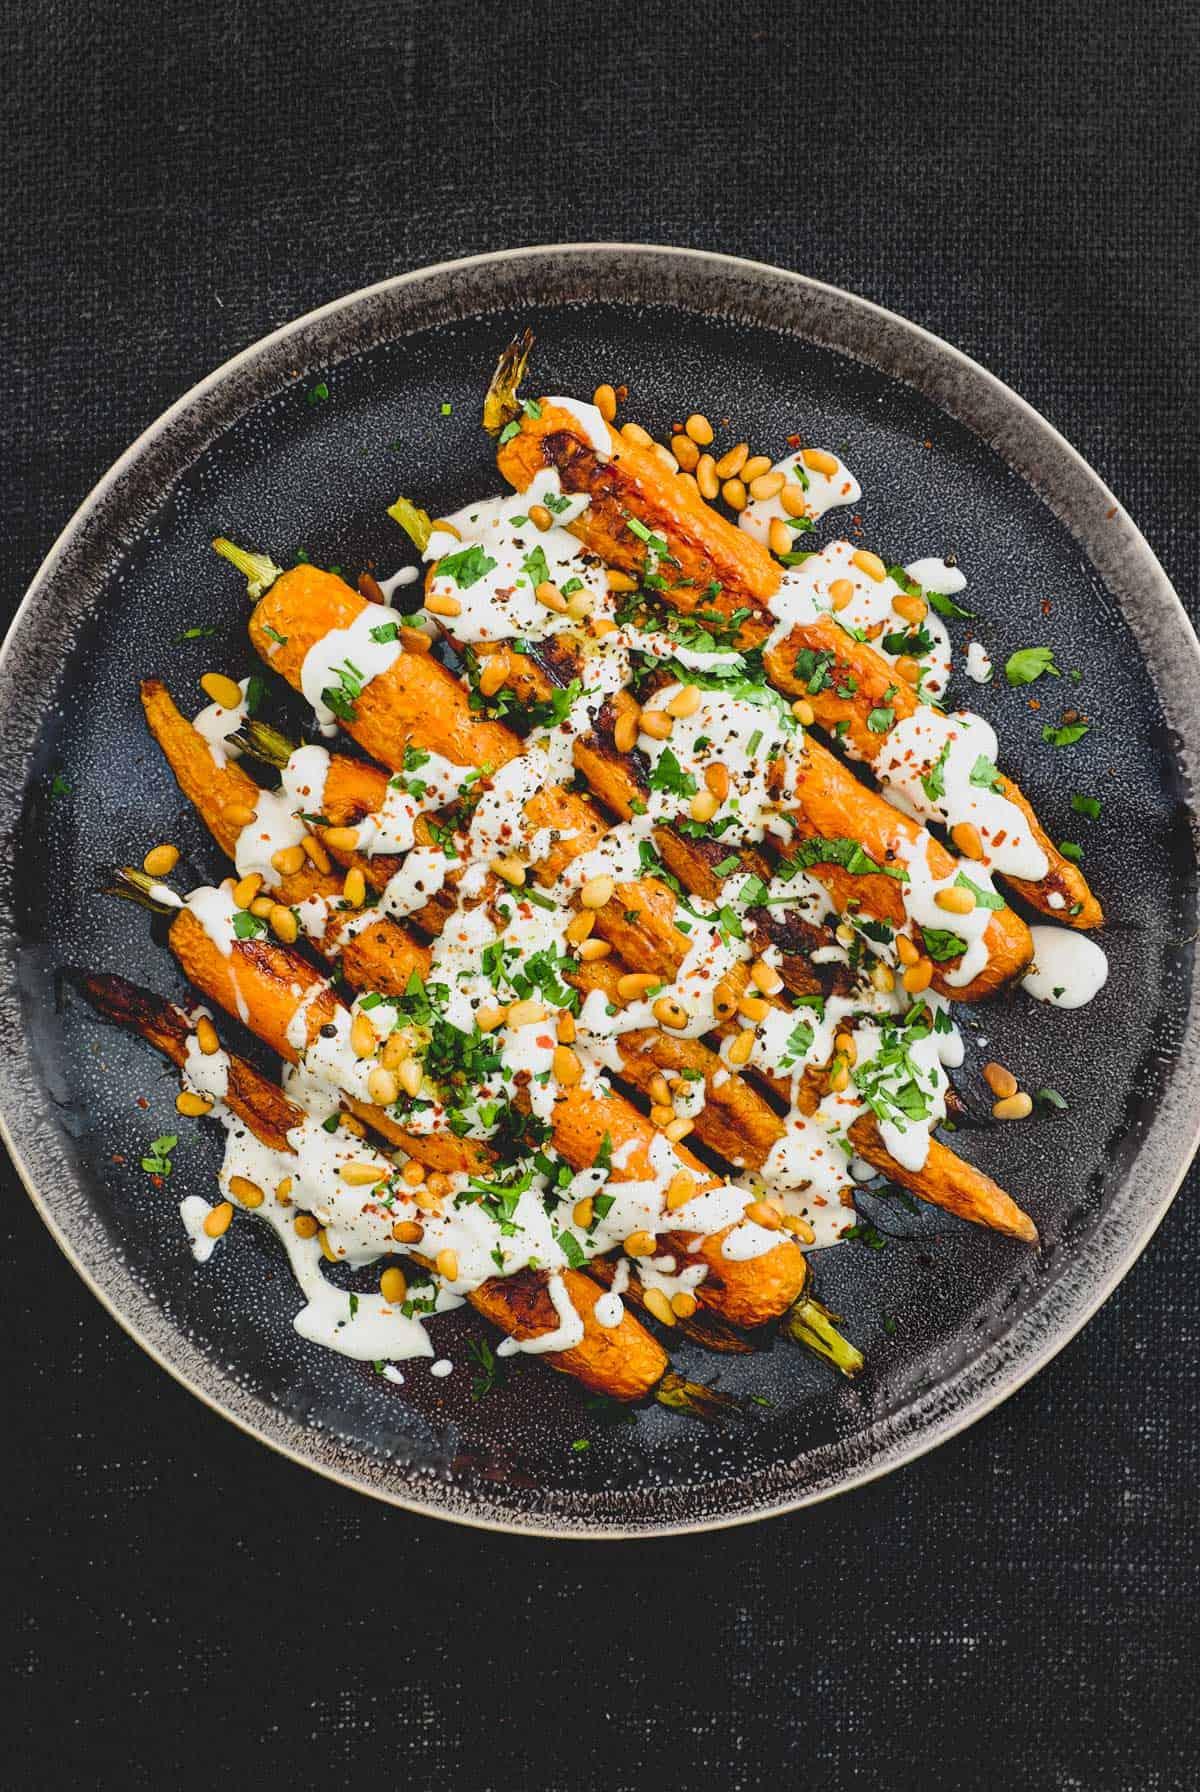 Roasted Carrot with Tahini Sauce